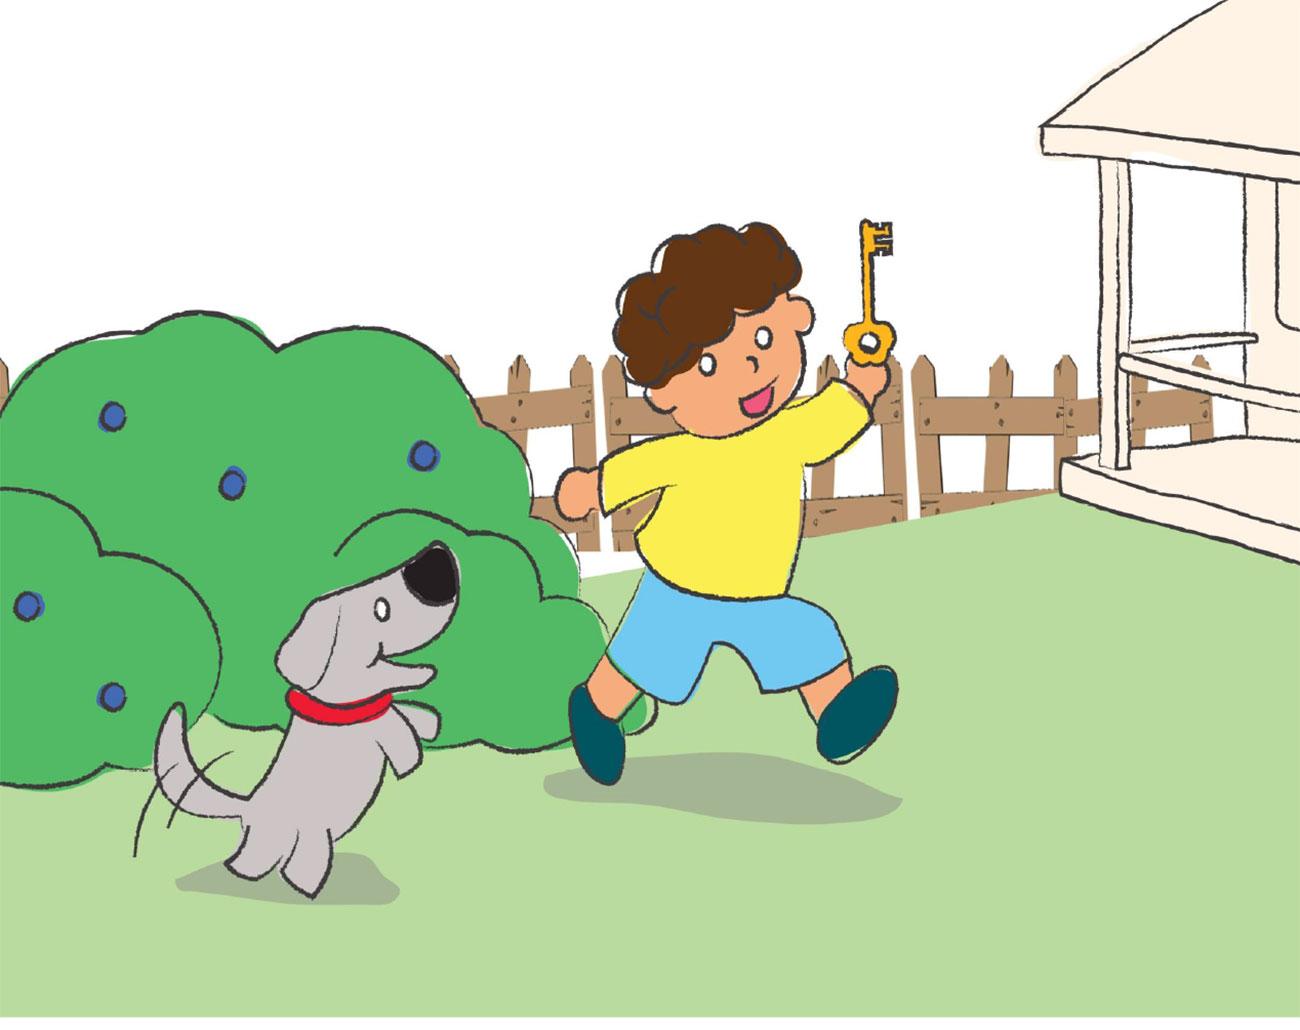 kids short story 'Down the memory lane with nash' by uma bala devarakonda - page 5